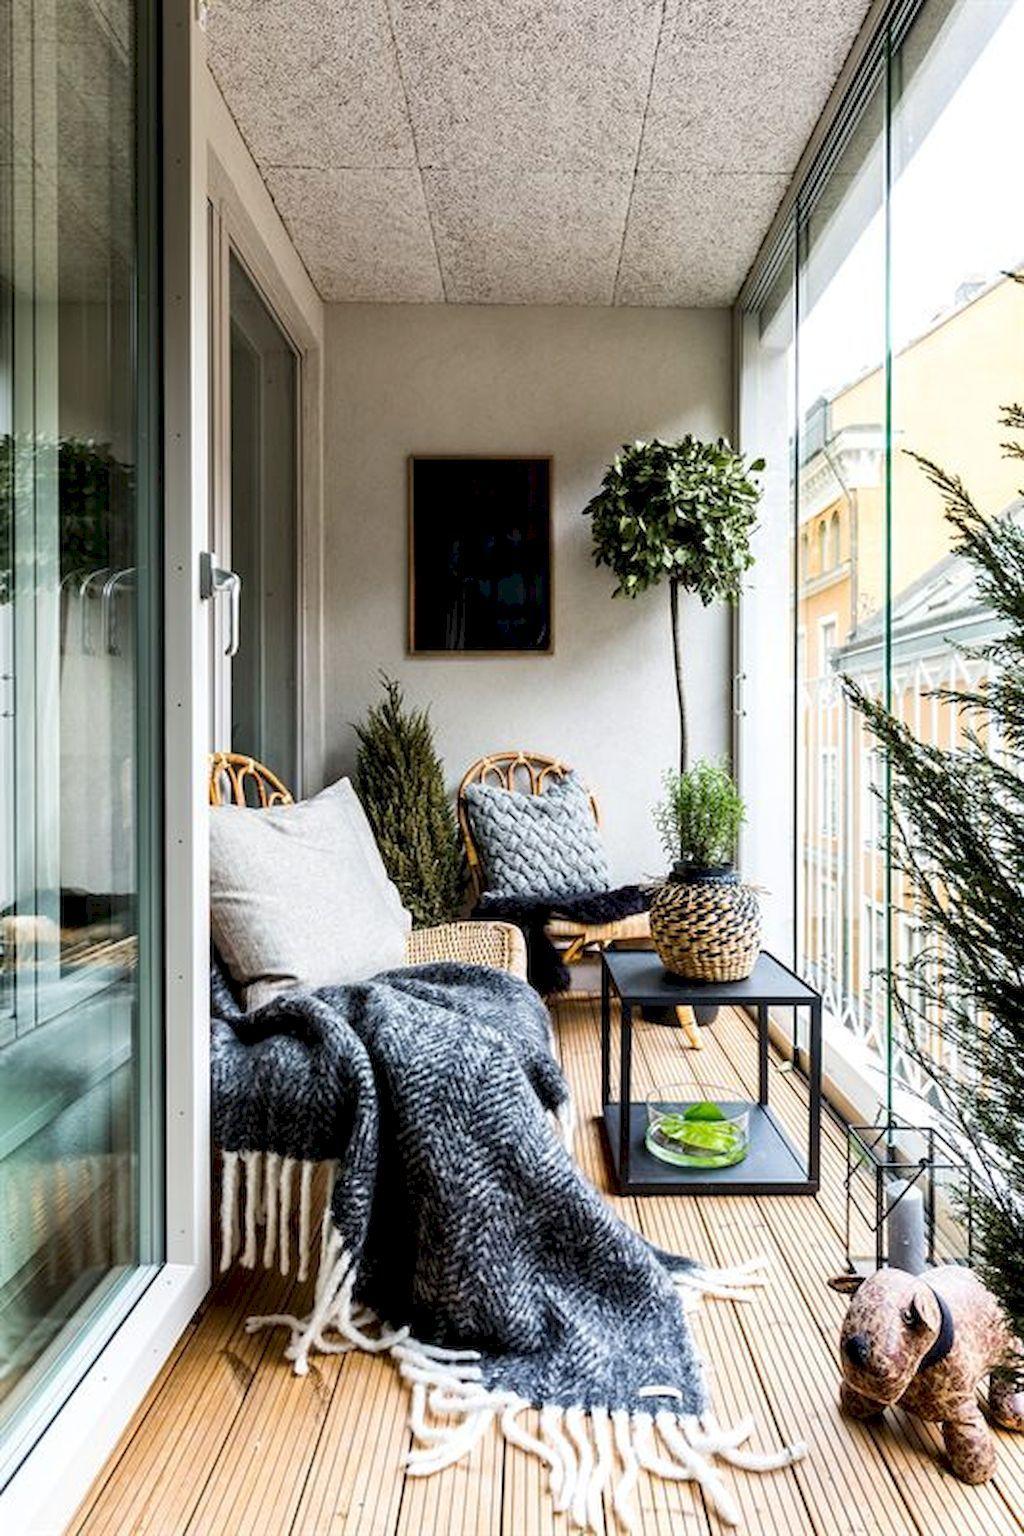 50 Porches And Patios Farmhouse Decorating Ideas Small Apartment